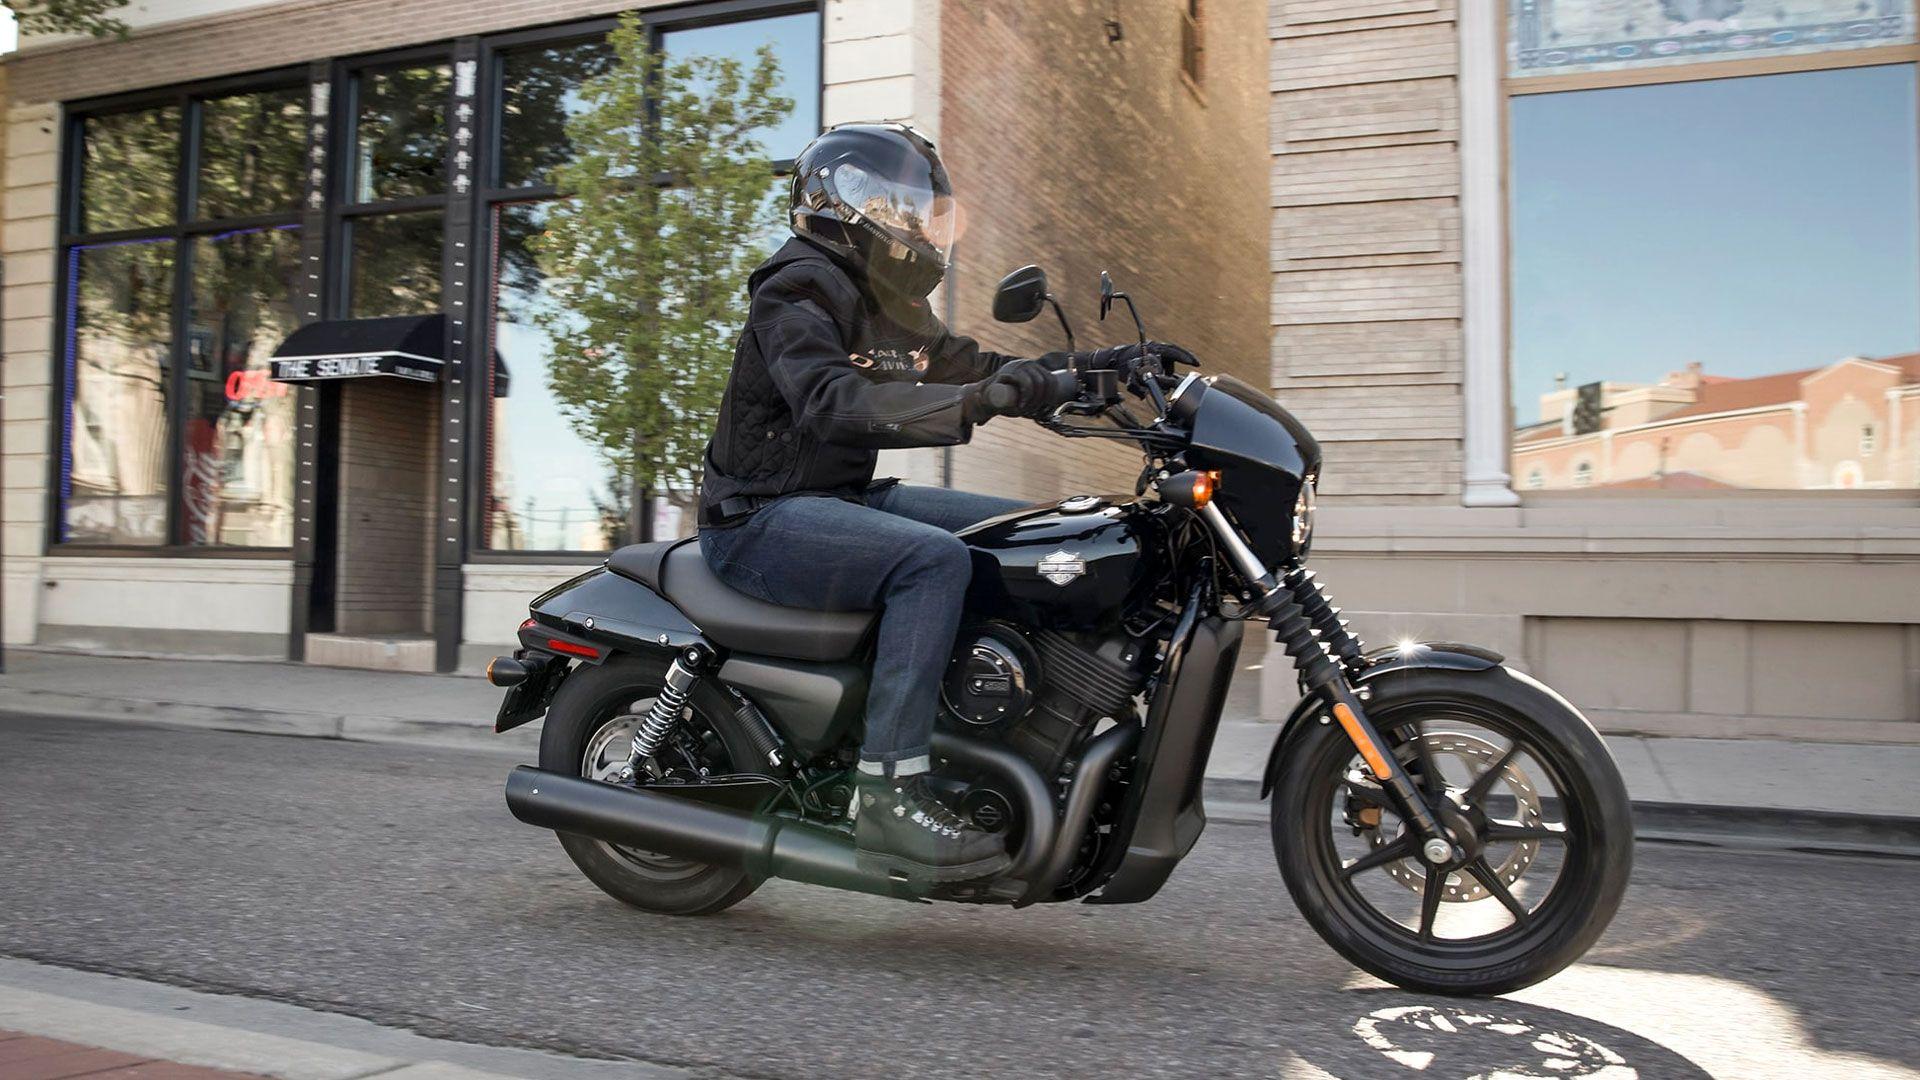 Harley Davidson Street 174 500 2019 Motorcycles Central